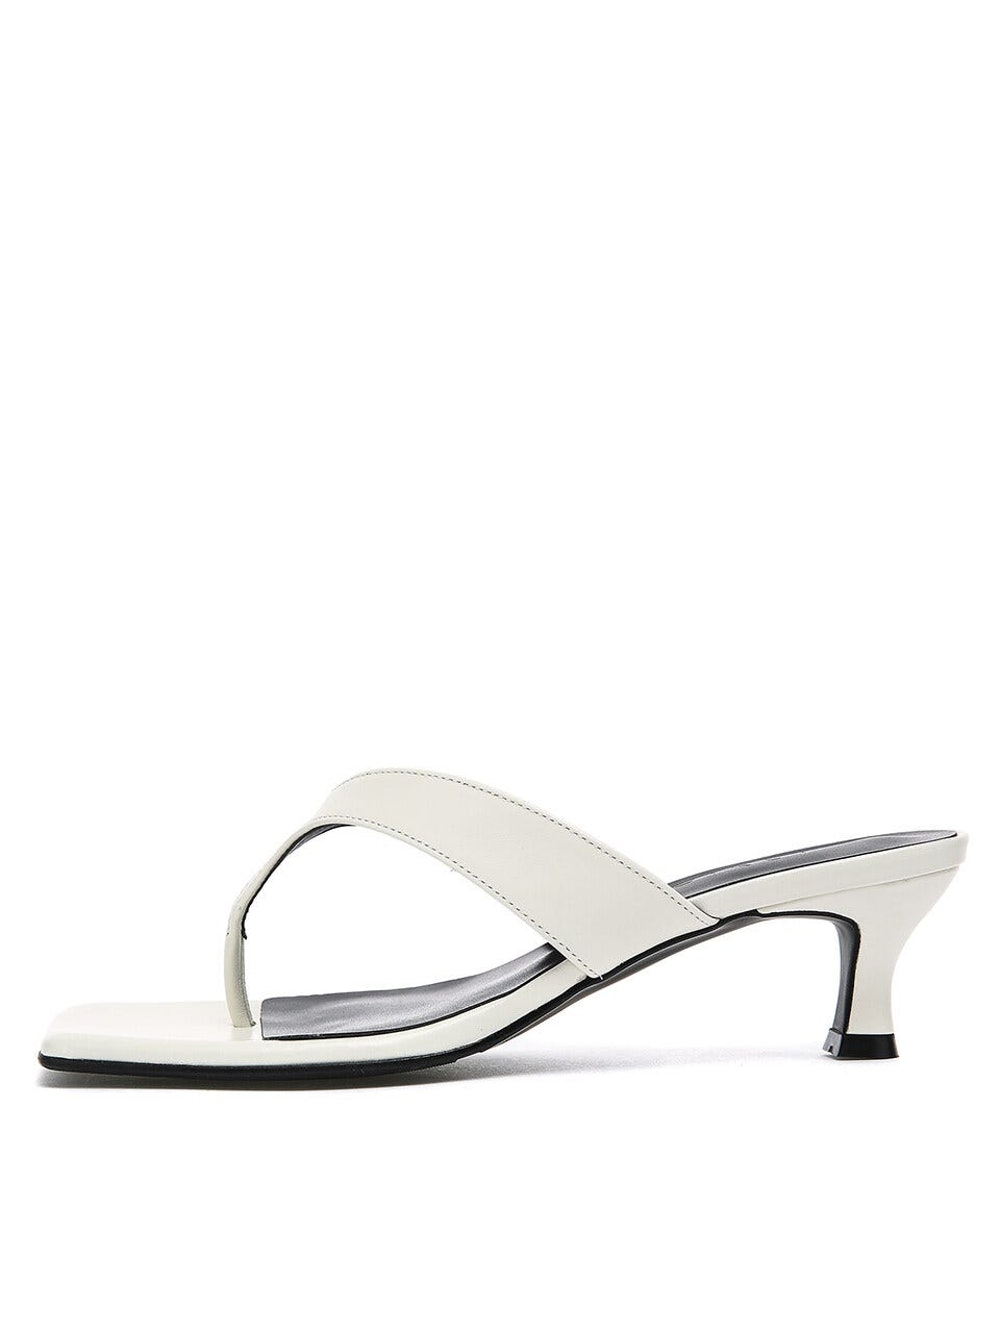 Lir 530 Flip flop Sandal